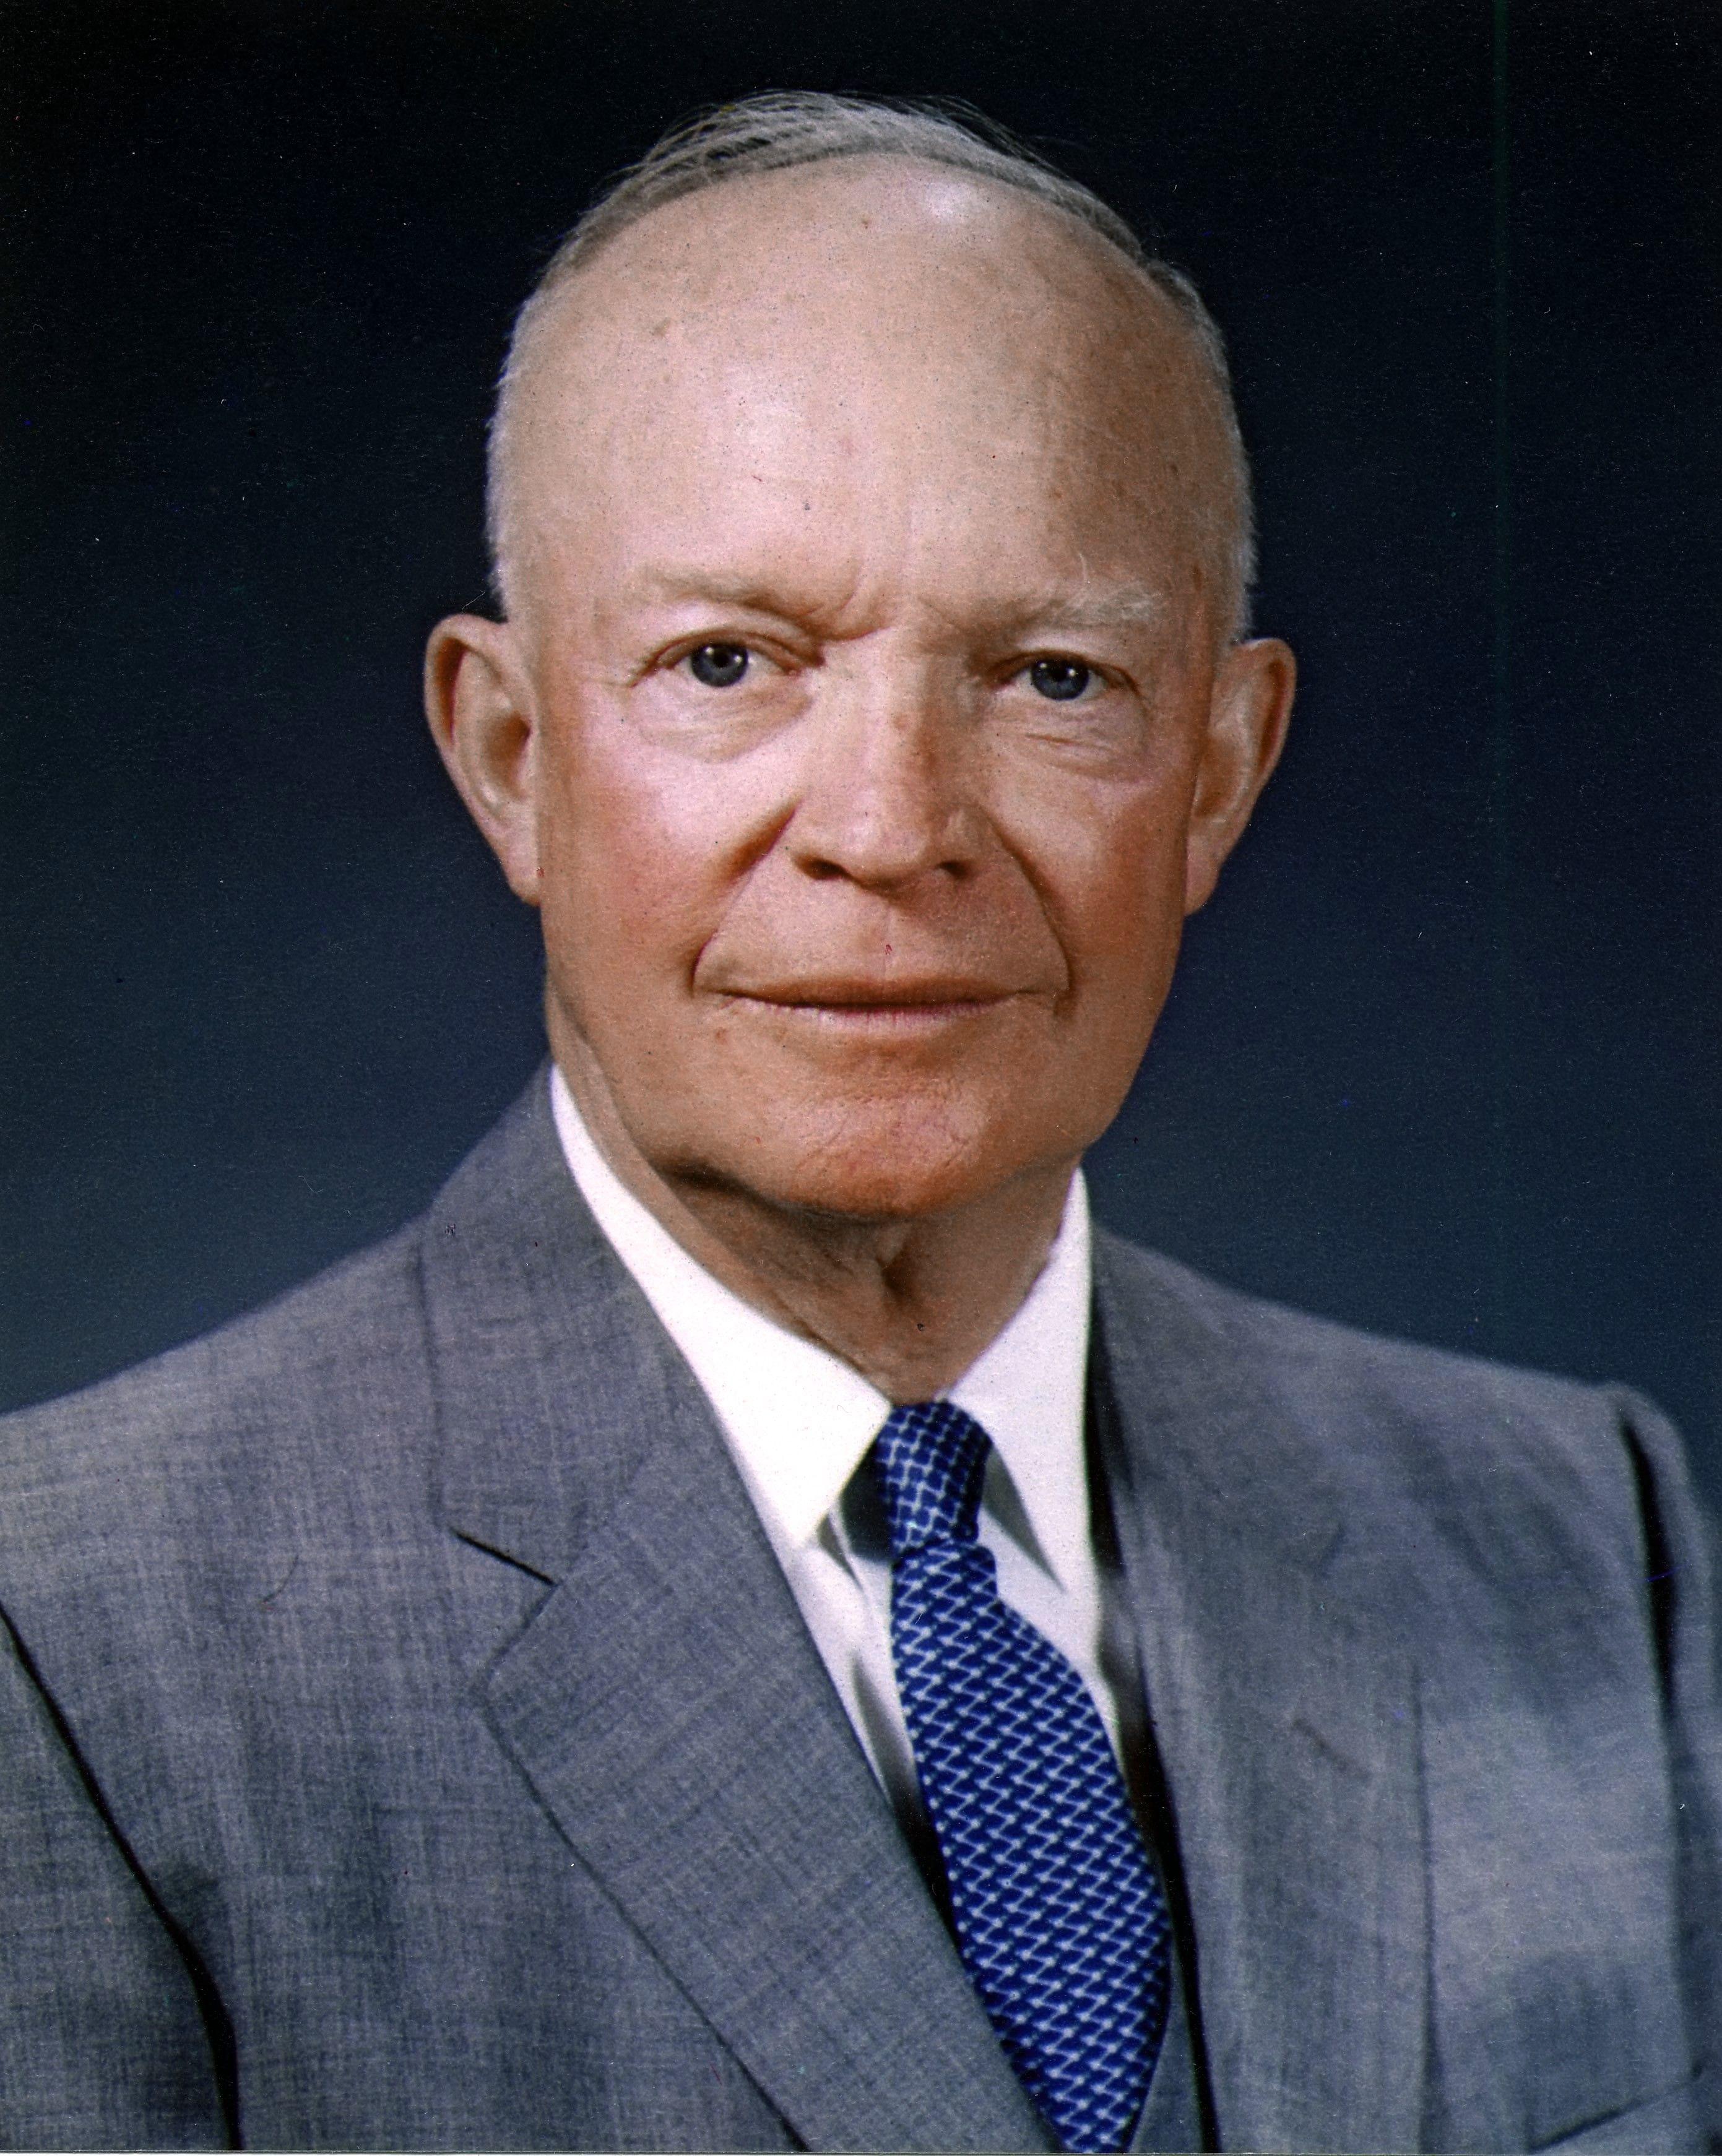 Dwight D. Eisenhower 34th U.S. President    Born: October 14, 1890, Denison, TX Died: March 28, 1969, Washington, D.C. Vice president: Richard Nixon (1953–1961) Presidential term: January 20, 1953 – January 20, 1961 Party: Republican Party Parents: David Jacob Eisenhower, Ida Stover Eisenhower